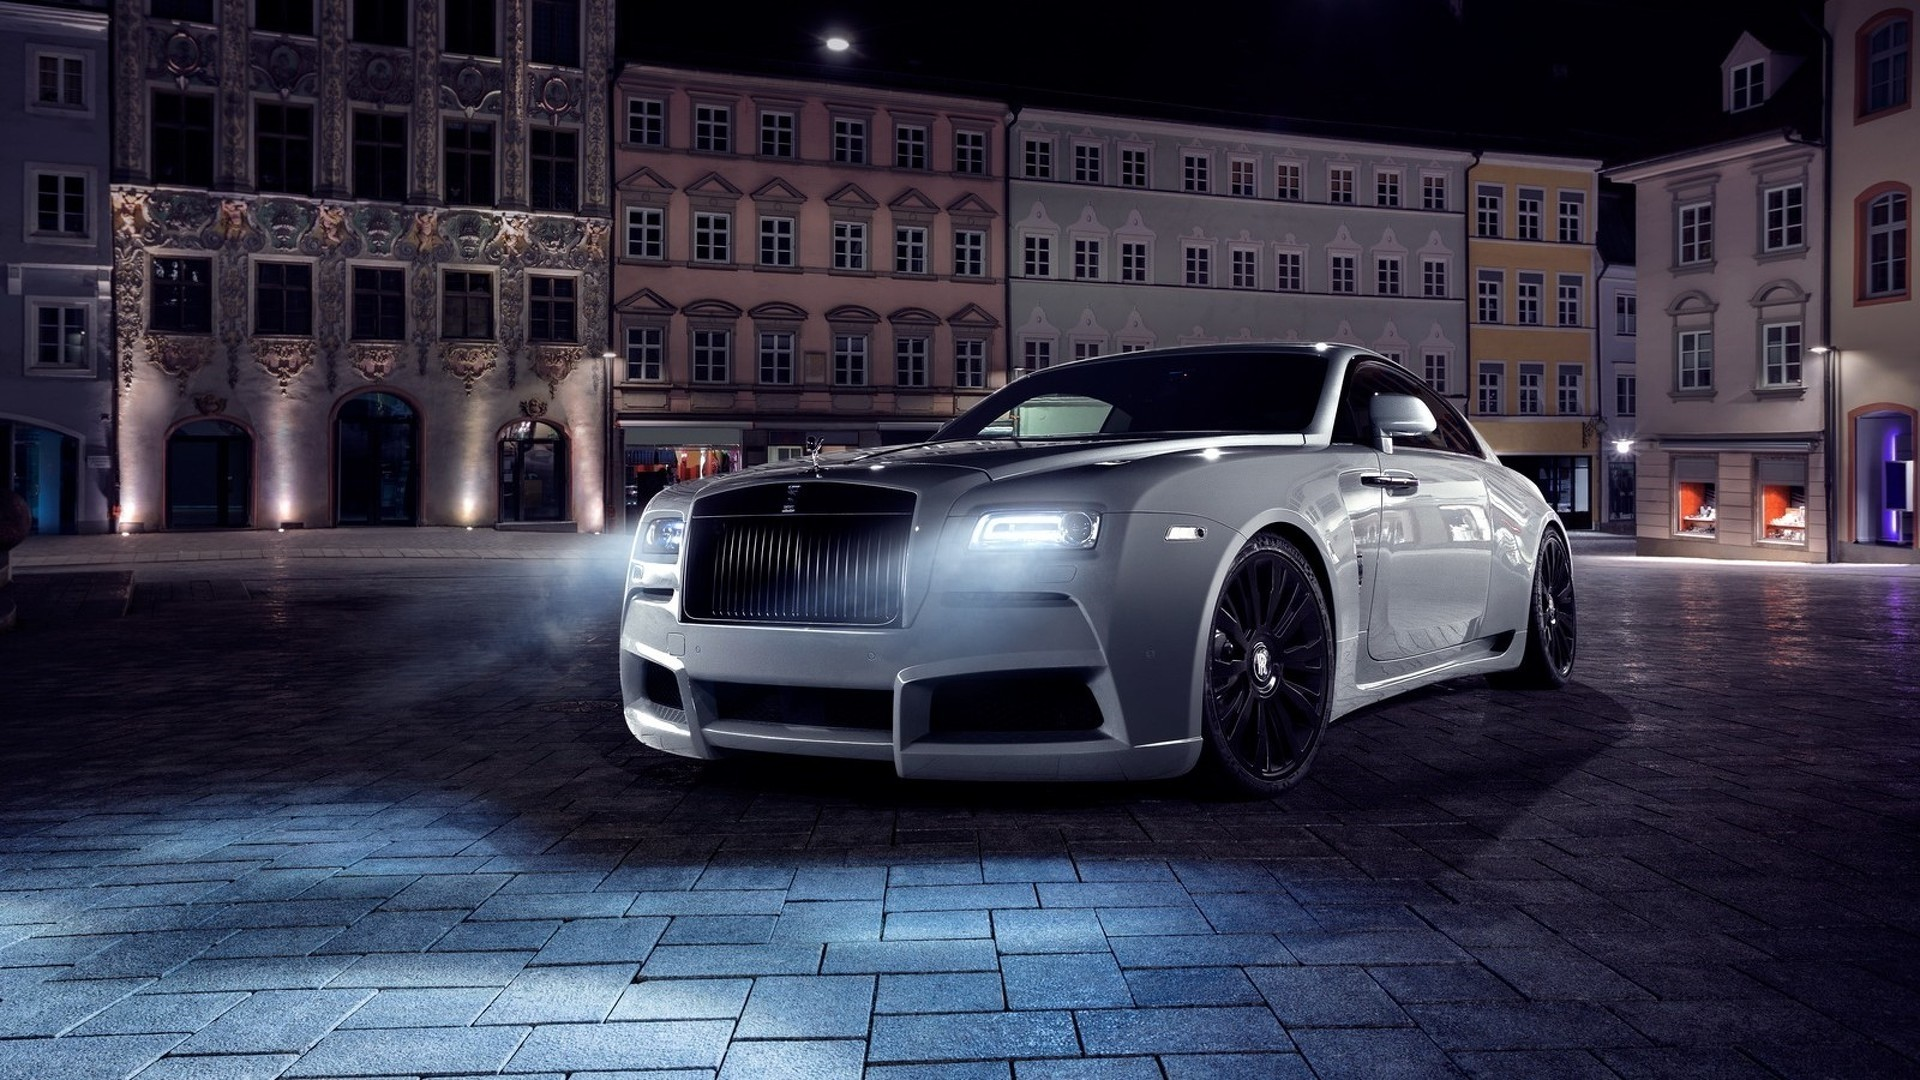 Rolls Royce Wraith Wallpaper image hd